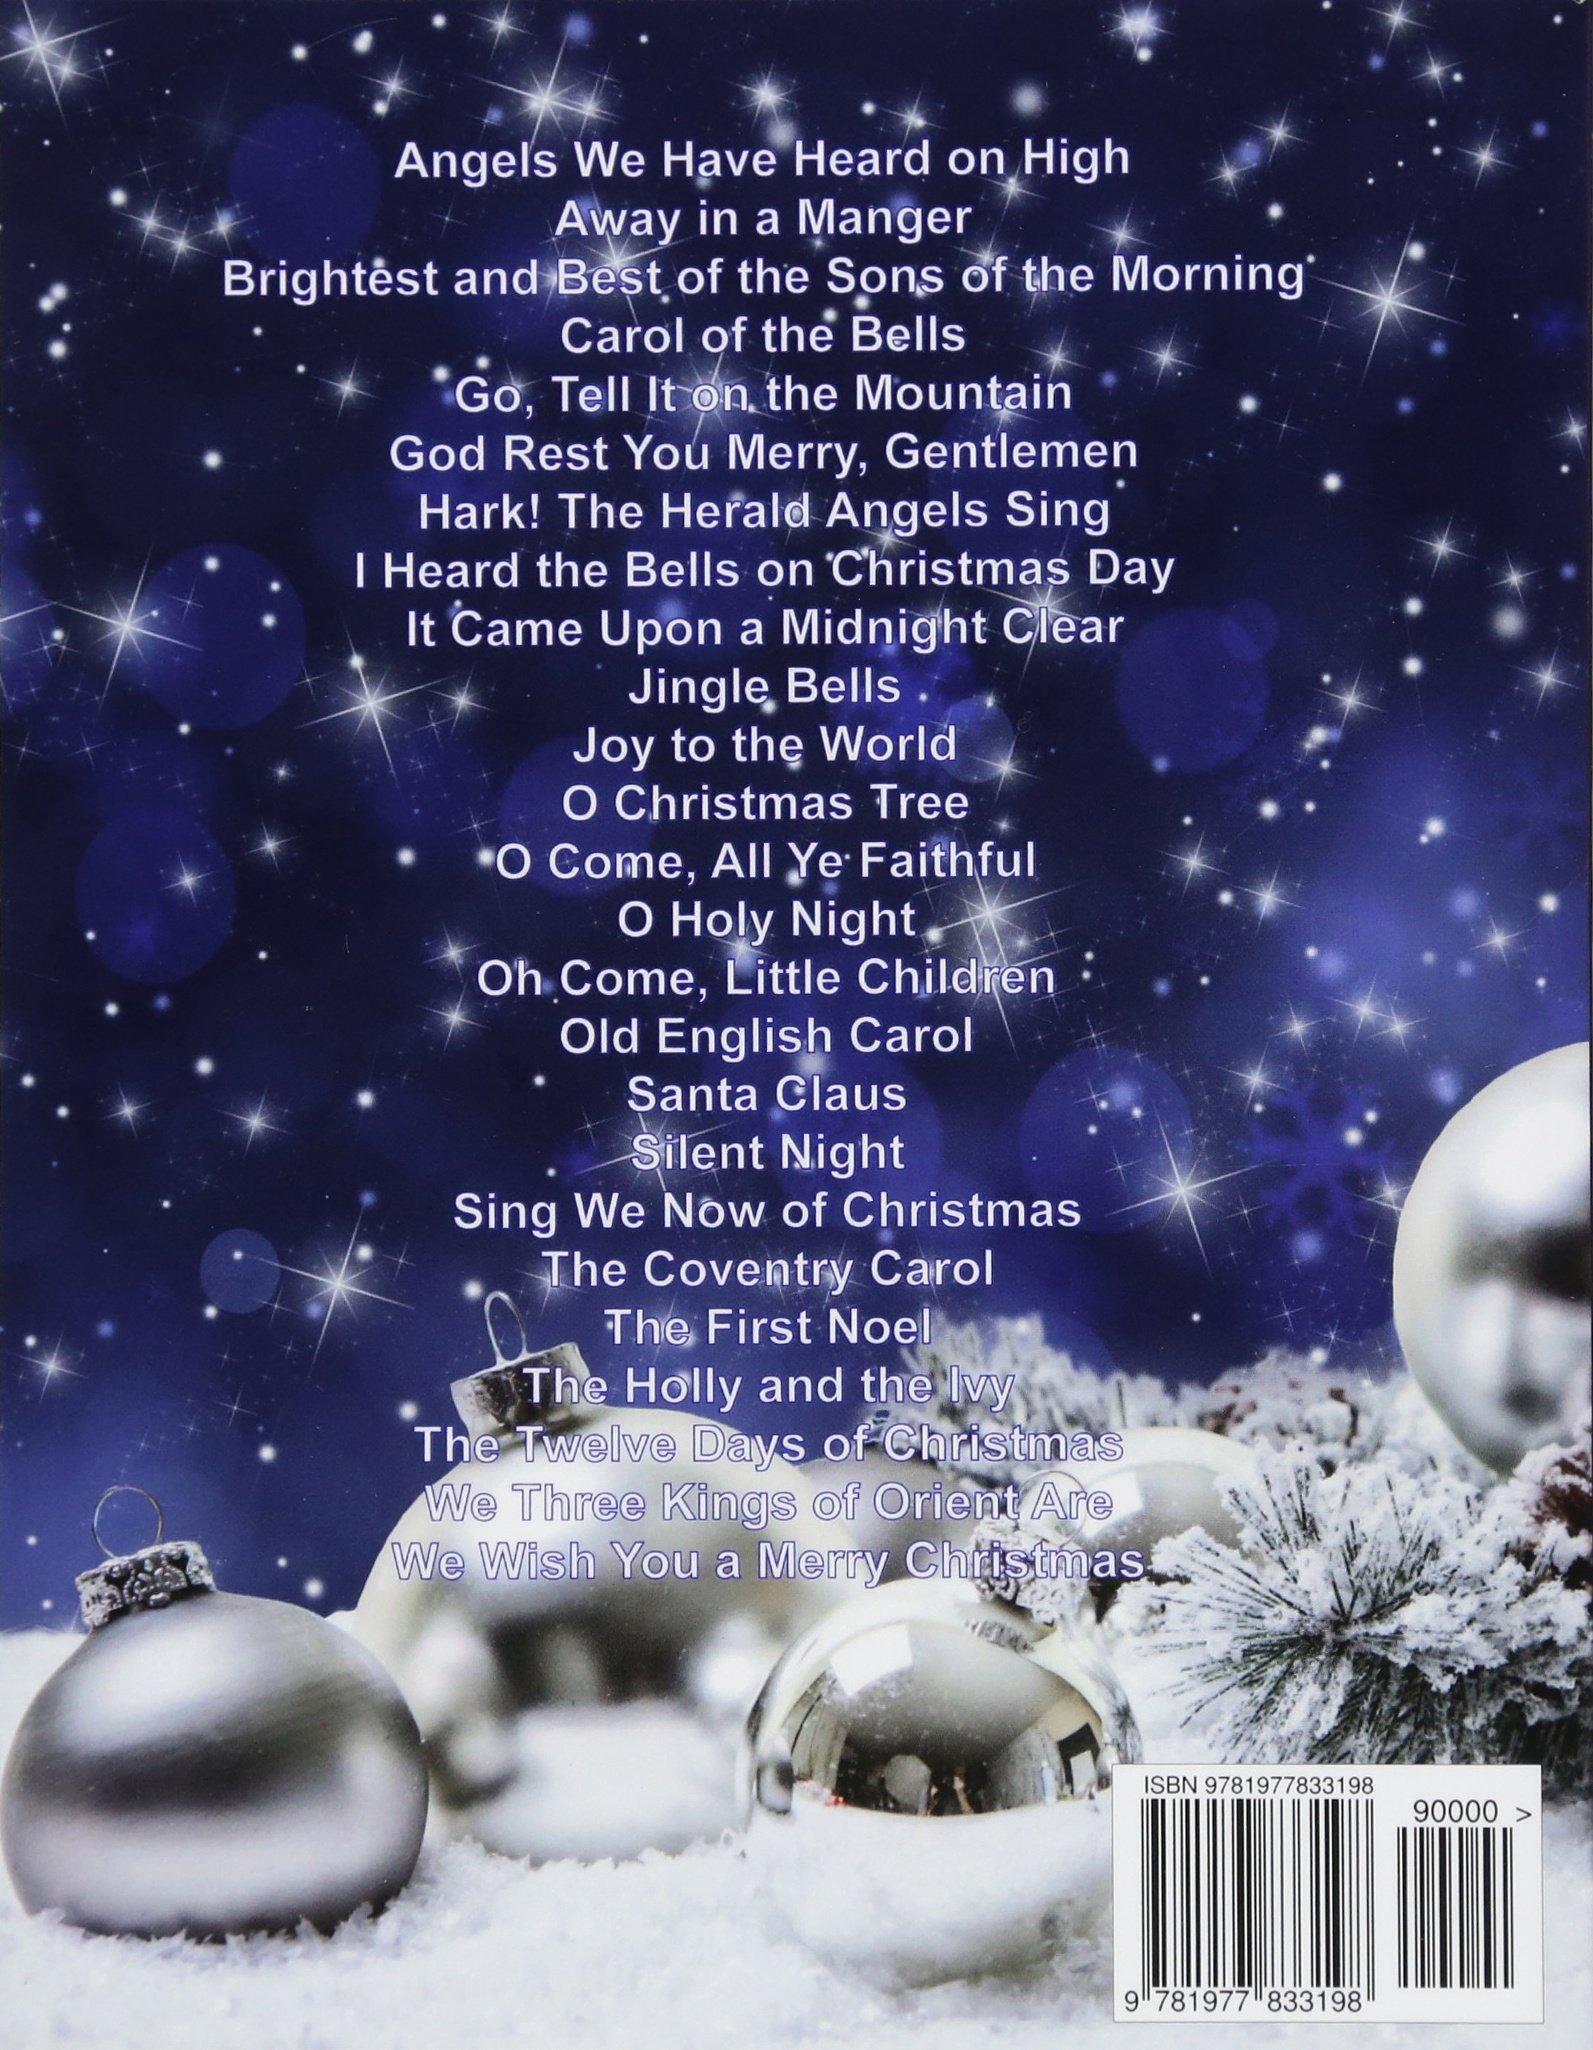 Amazon.com: Ukulele Christmas Songs: TABs and Chords (9781977833198 ...